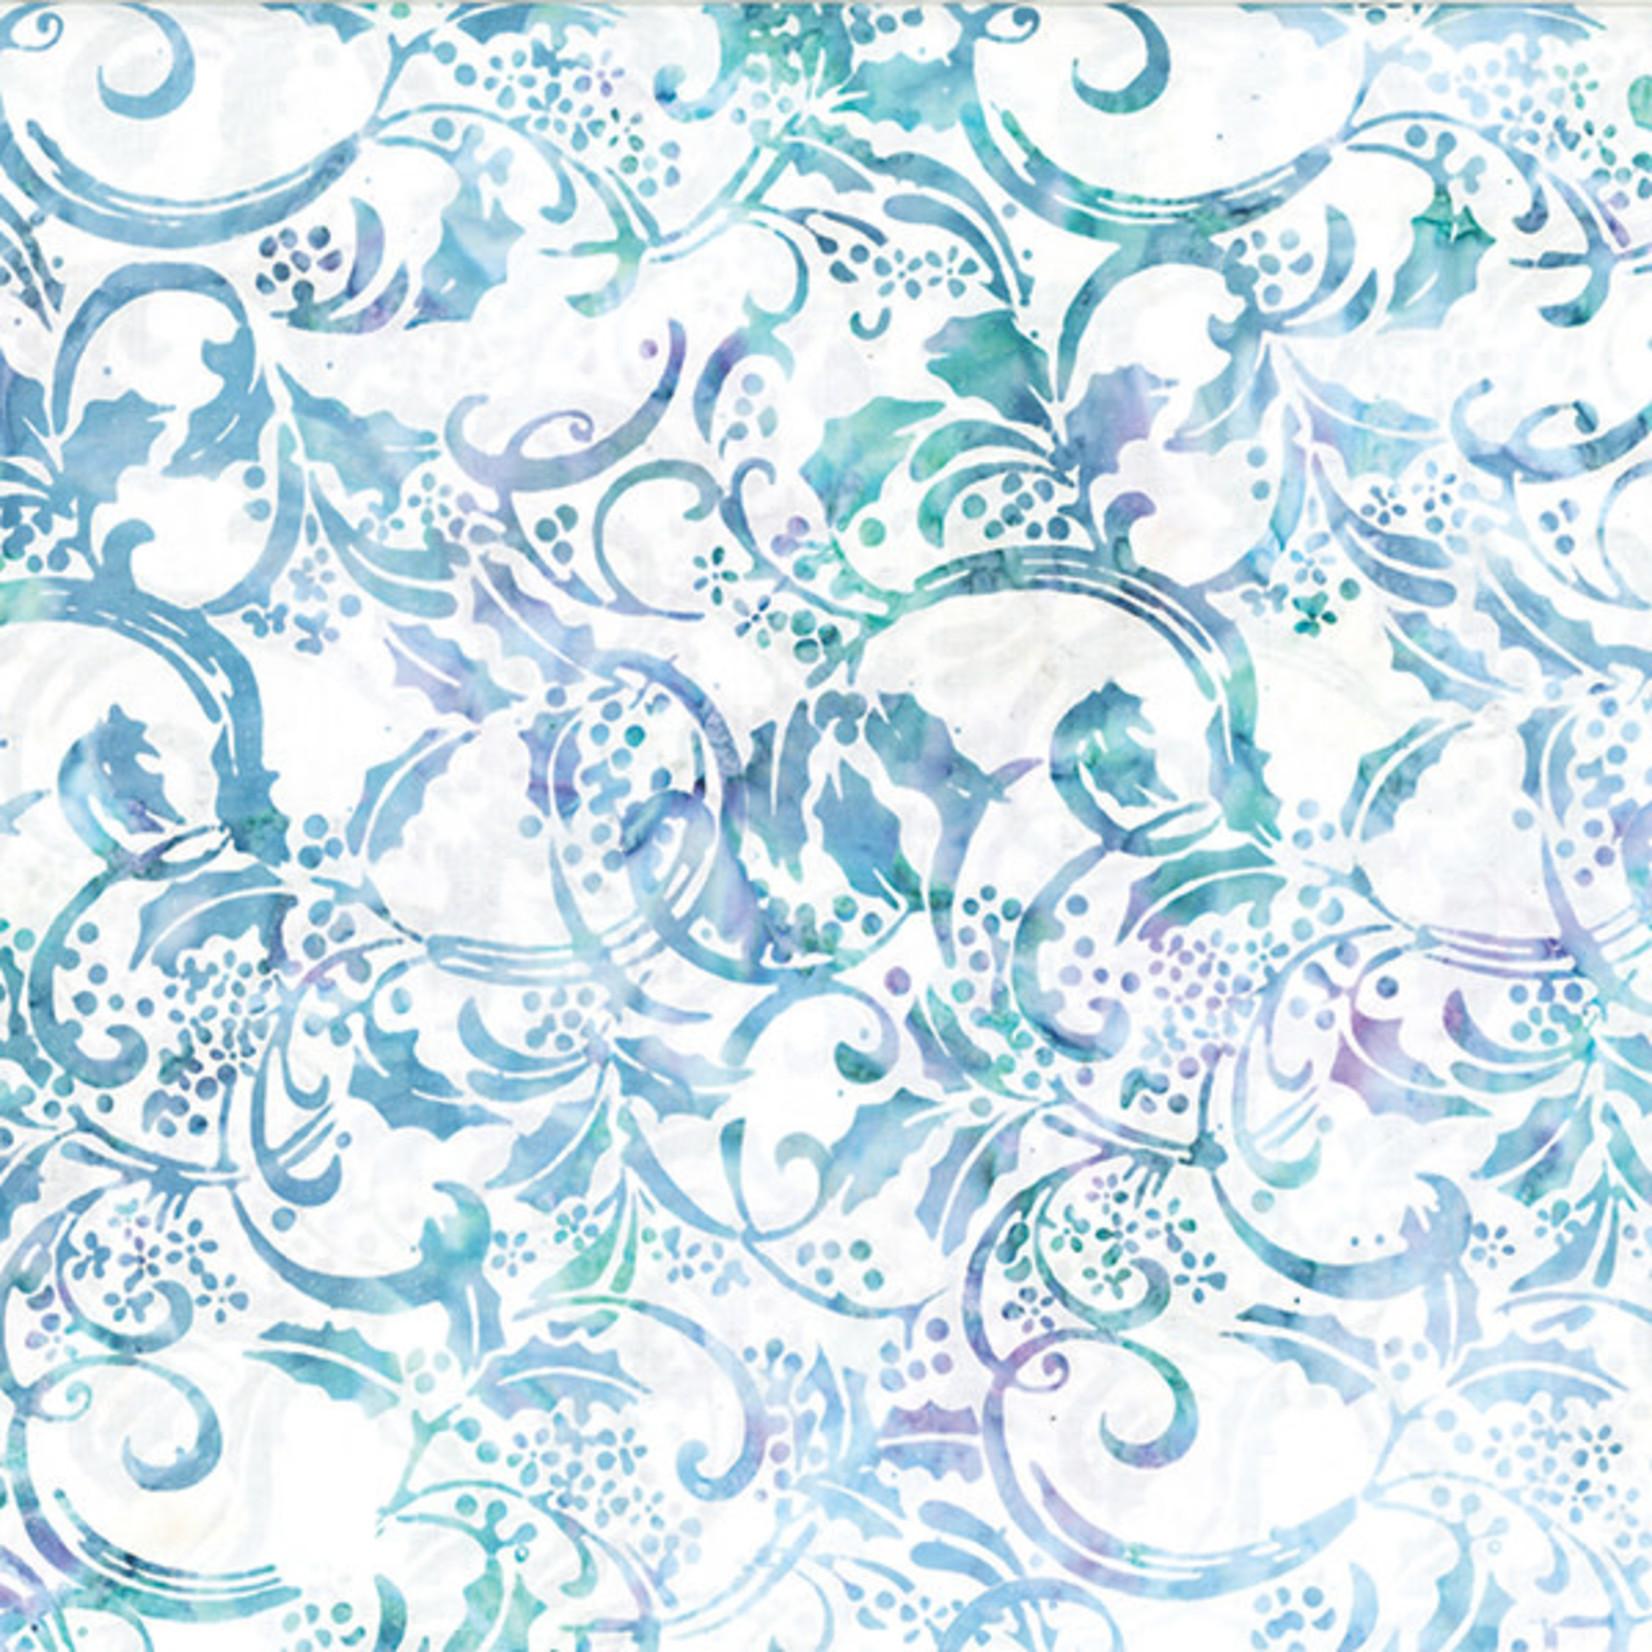 Hoffman Fabrics Bali Batik Holly Leaves - Aurora